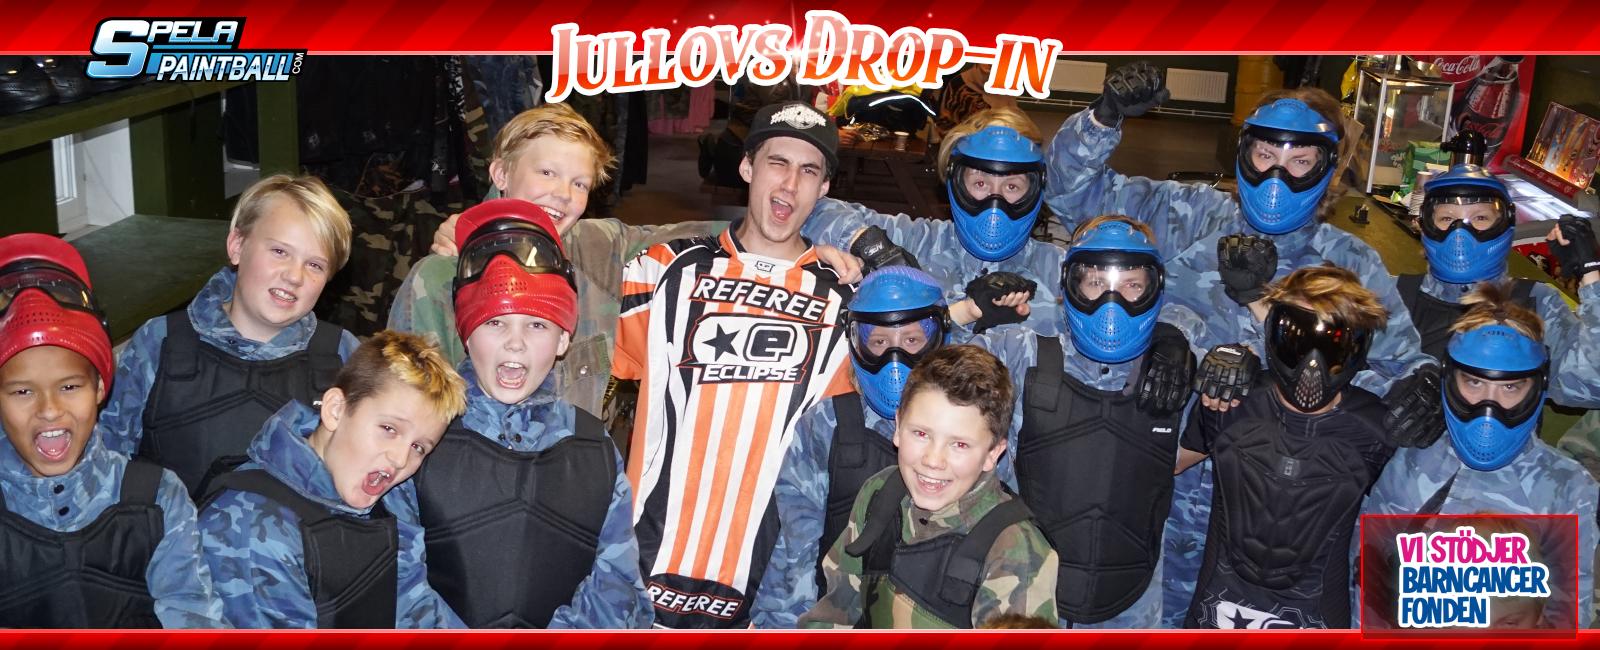 Jullovs drop-in